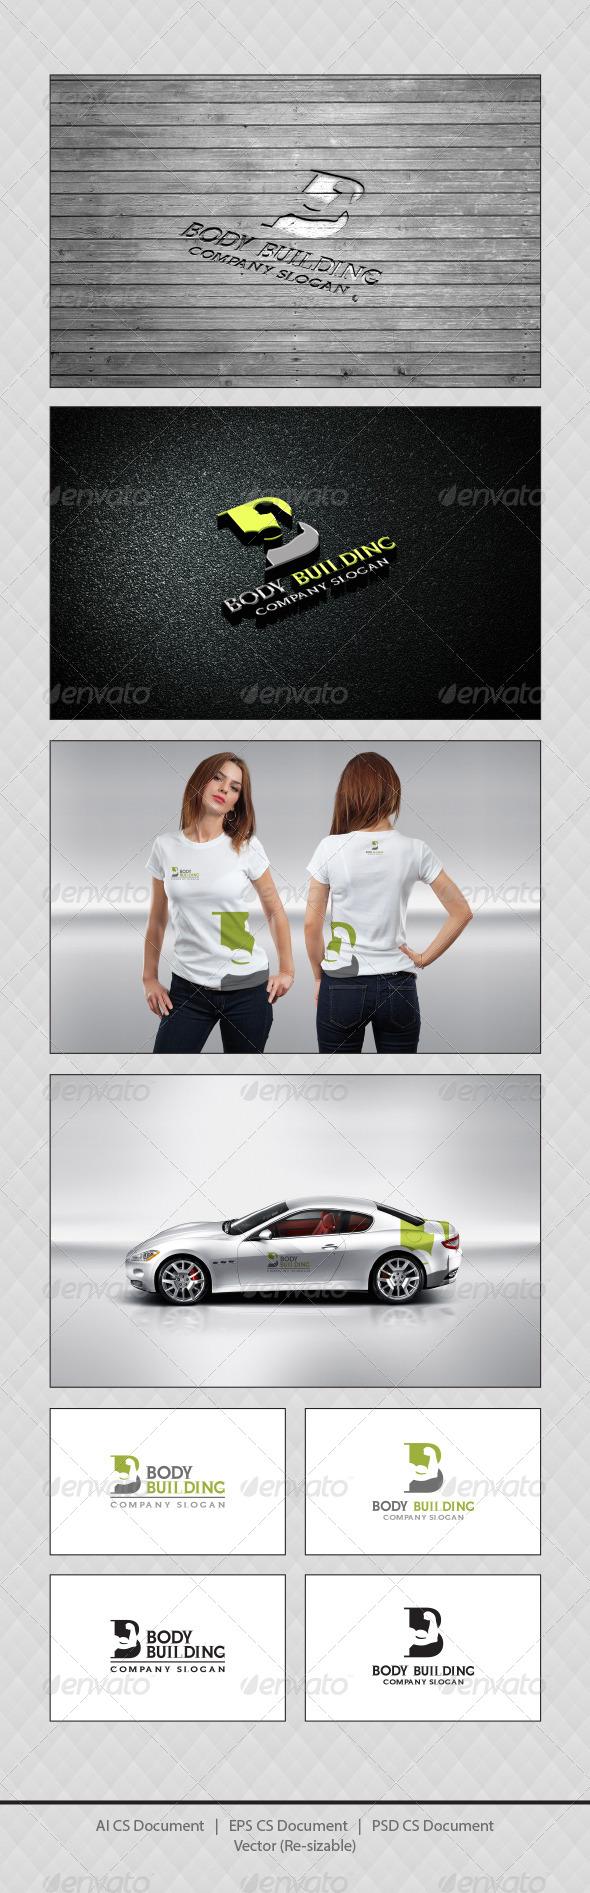 GraphicRiver Body Building Logo Templates 4361708